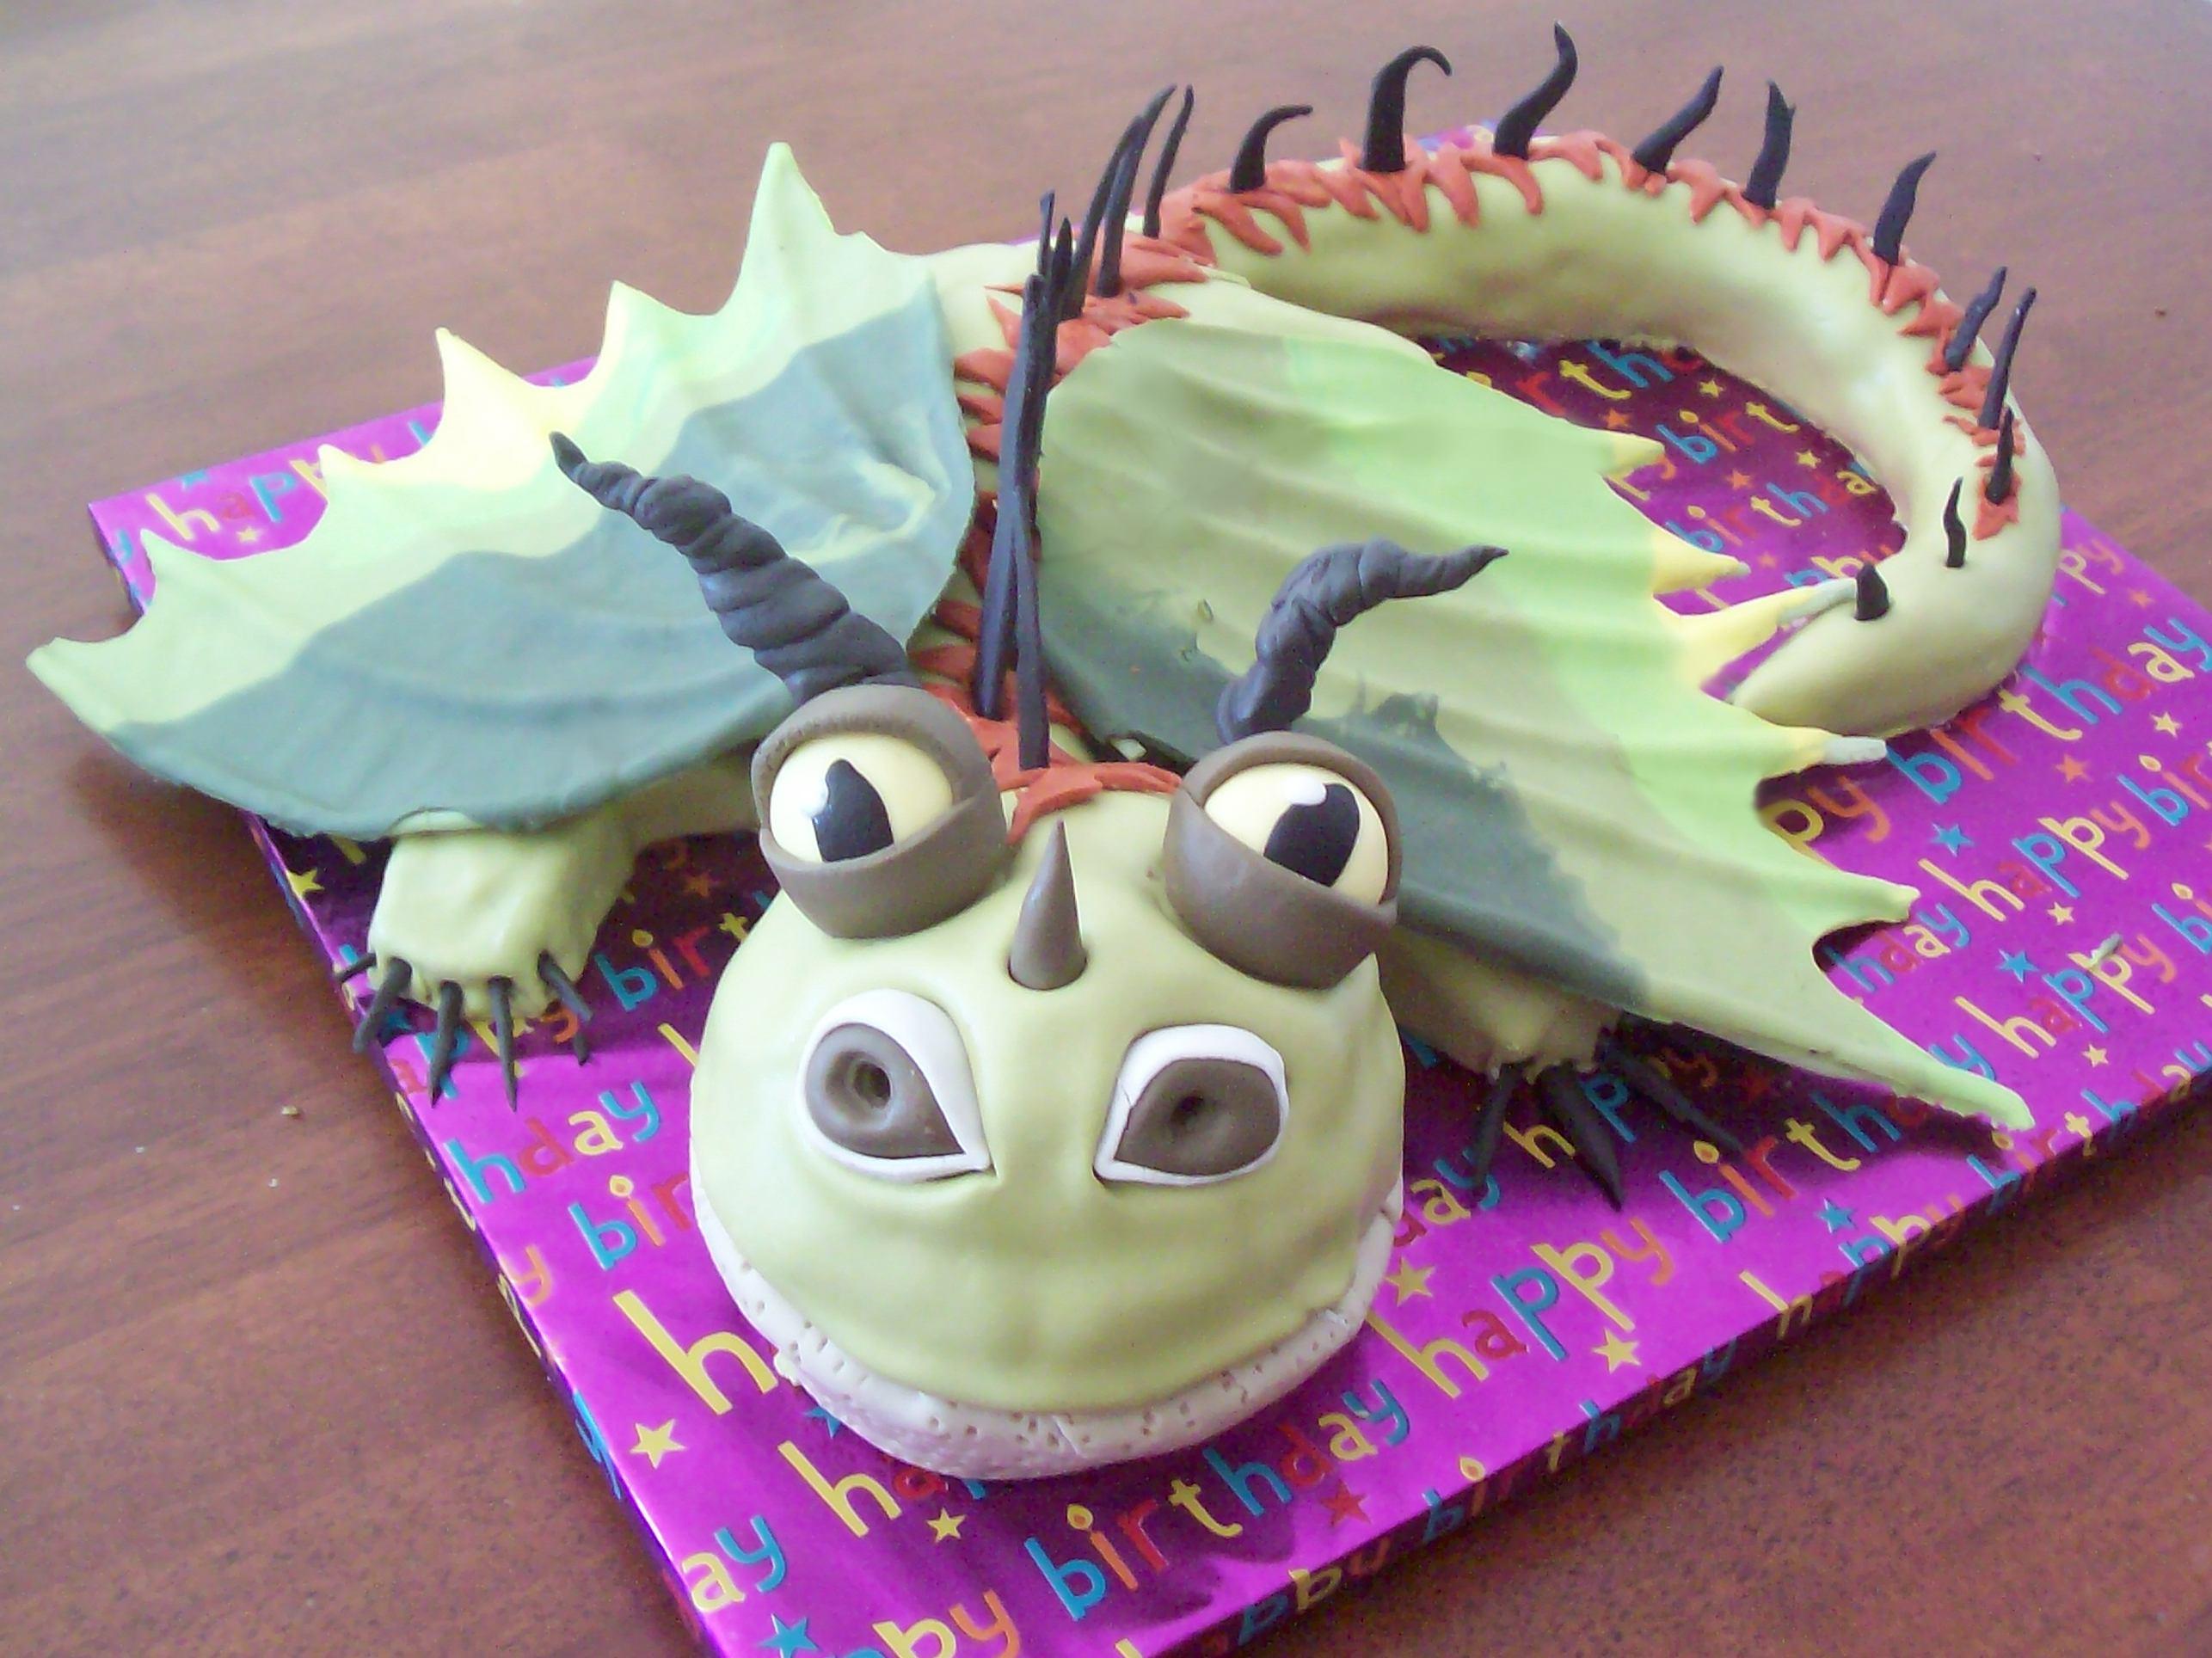 howtocookthat : cakes, dessert & chocolate | sugar paste / fondant